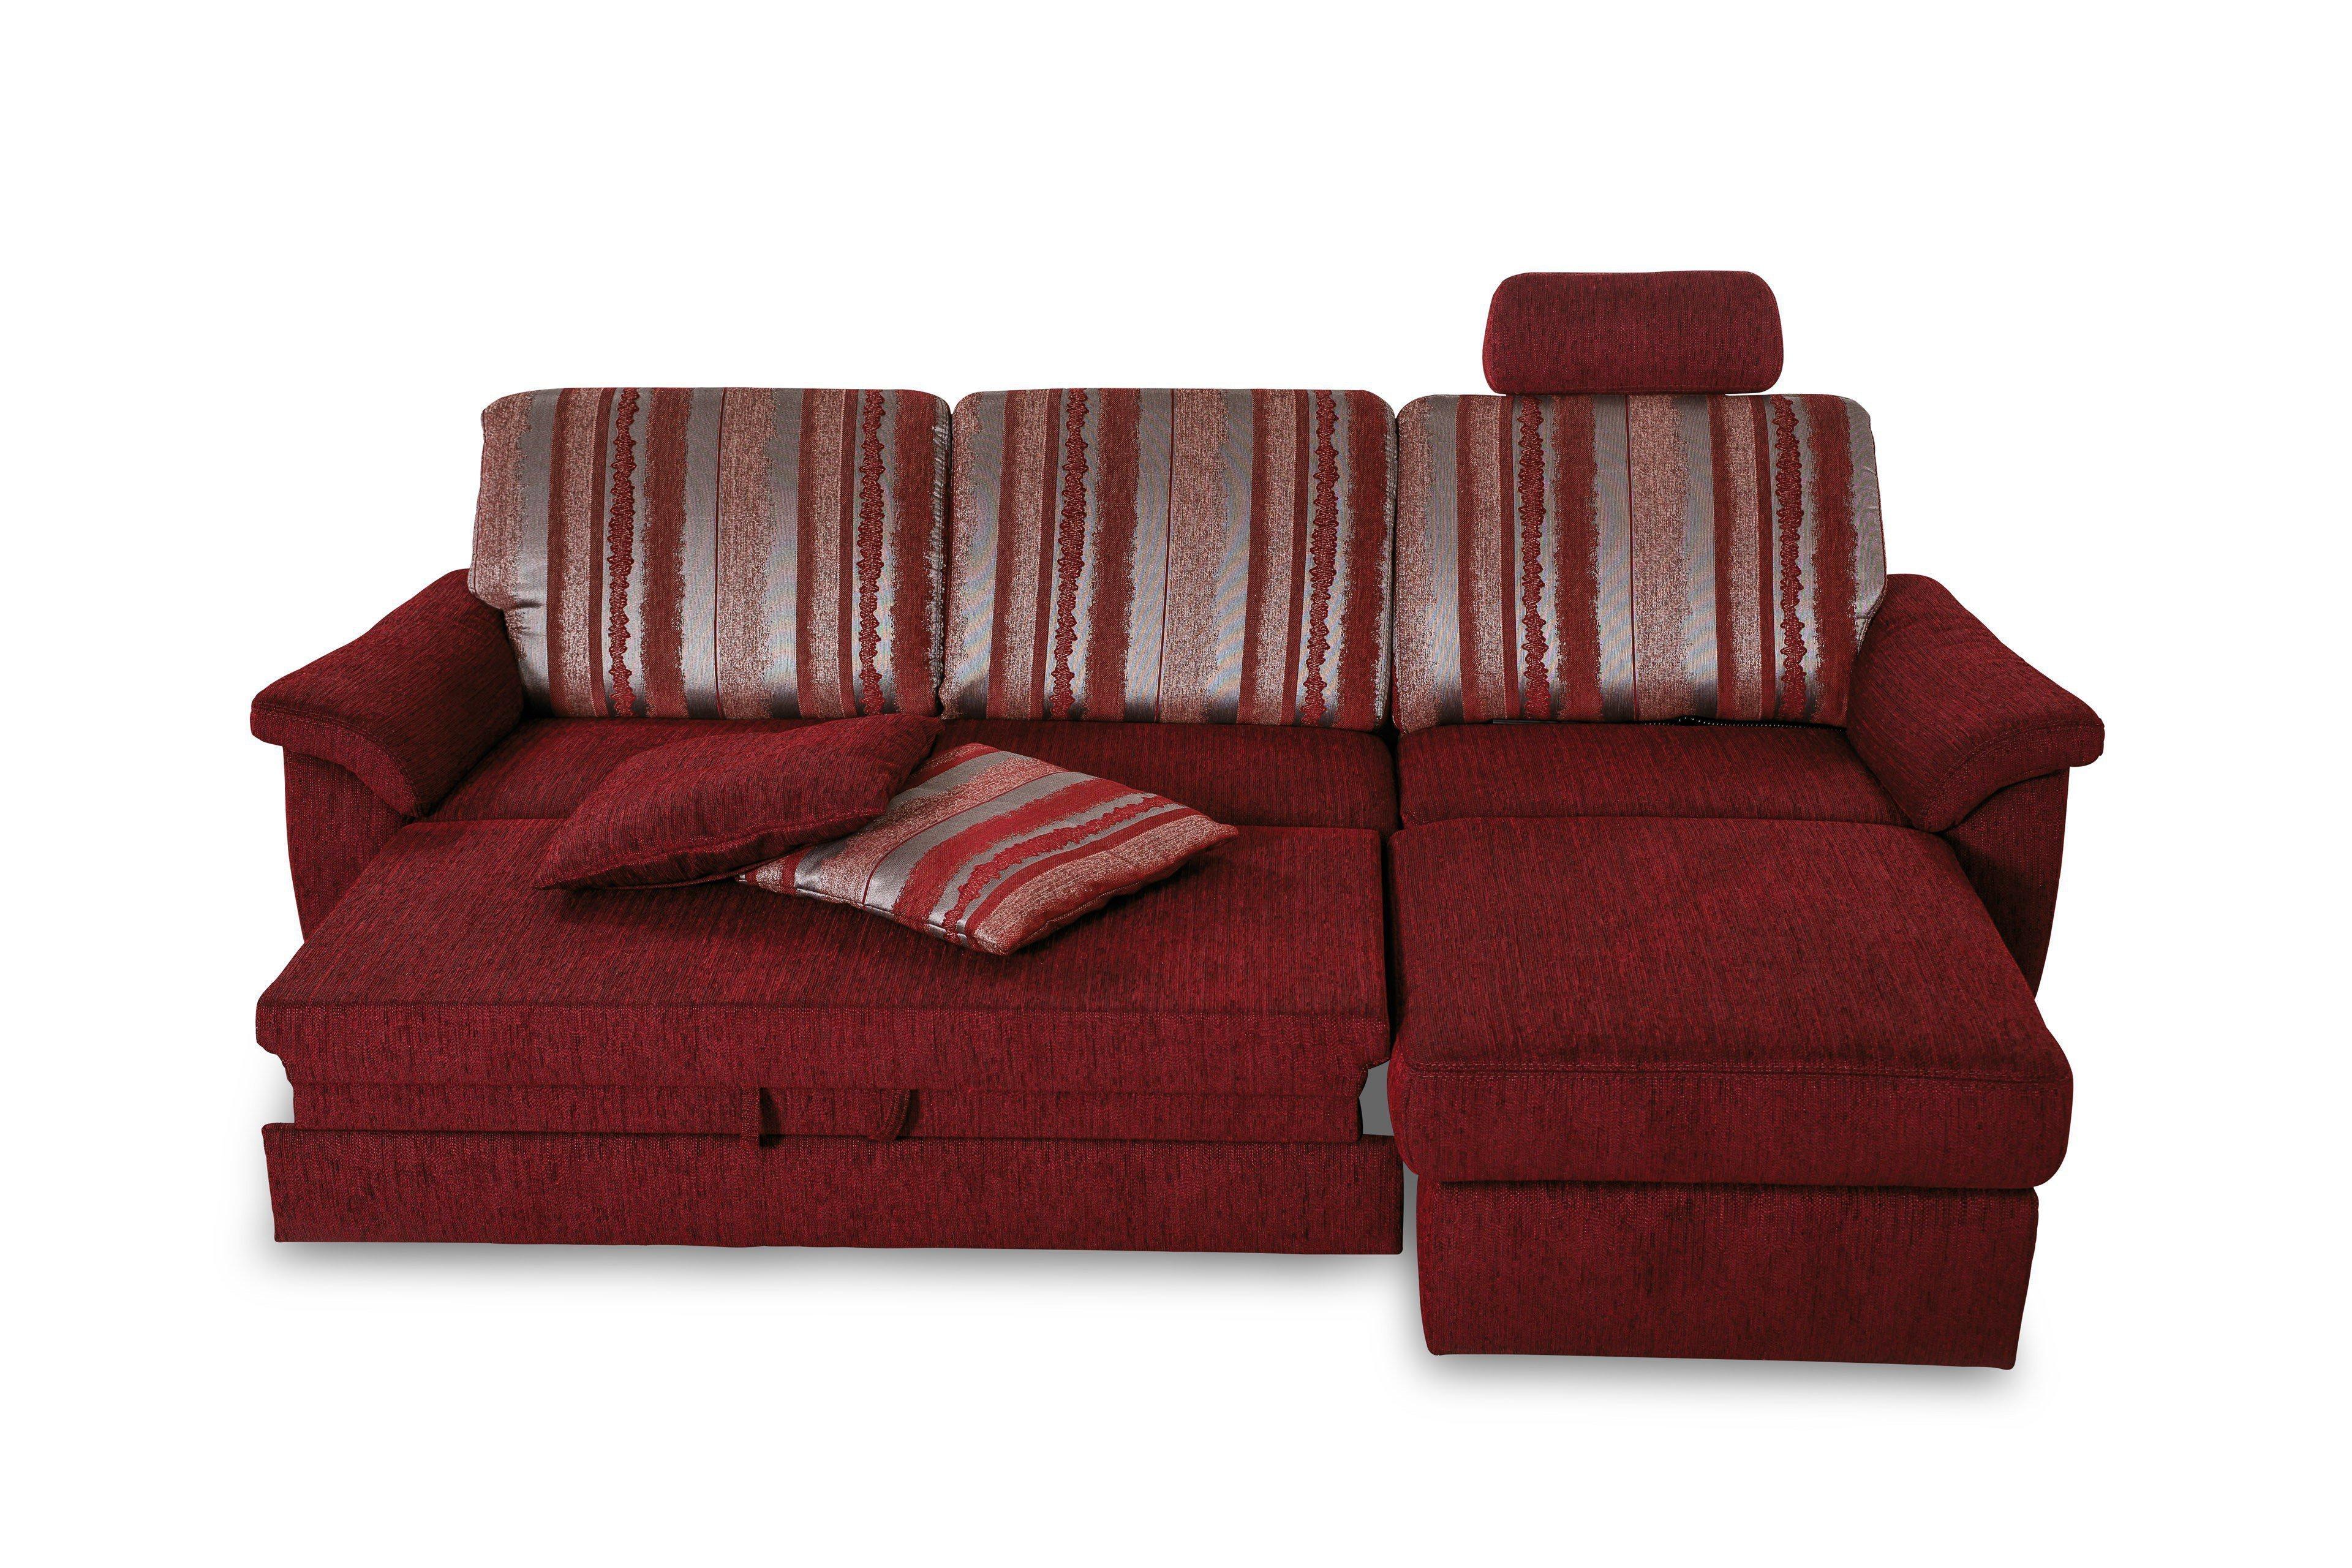 pm oelsa toledo polstergarnitur in rot m bel letz ihr online shop. Black Bedroom Furniture Sets. Home Design Ideas